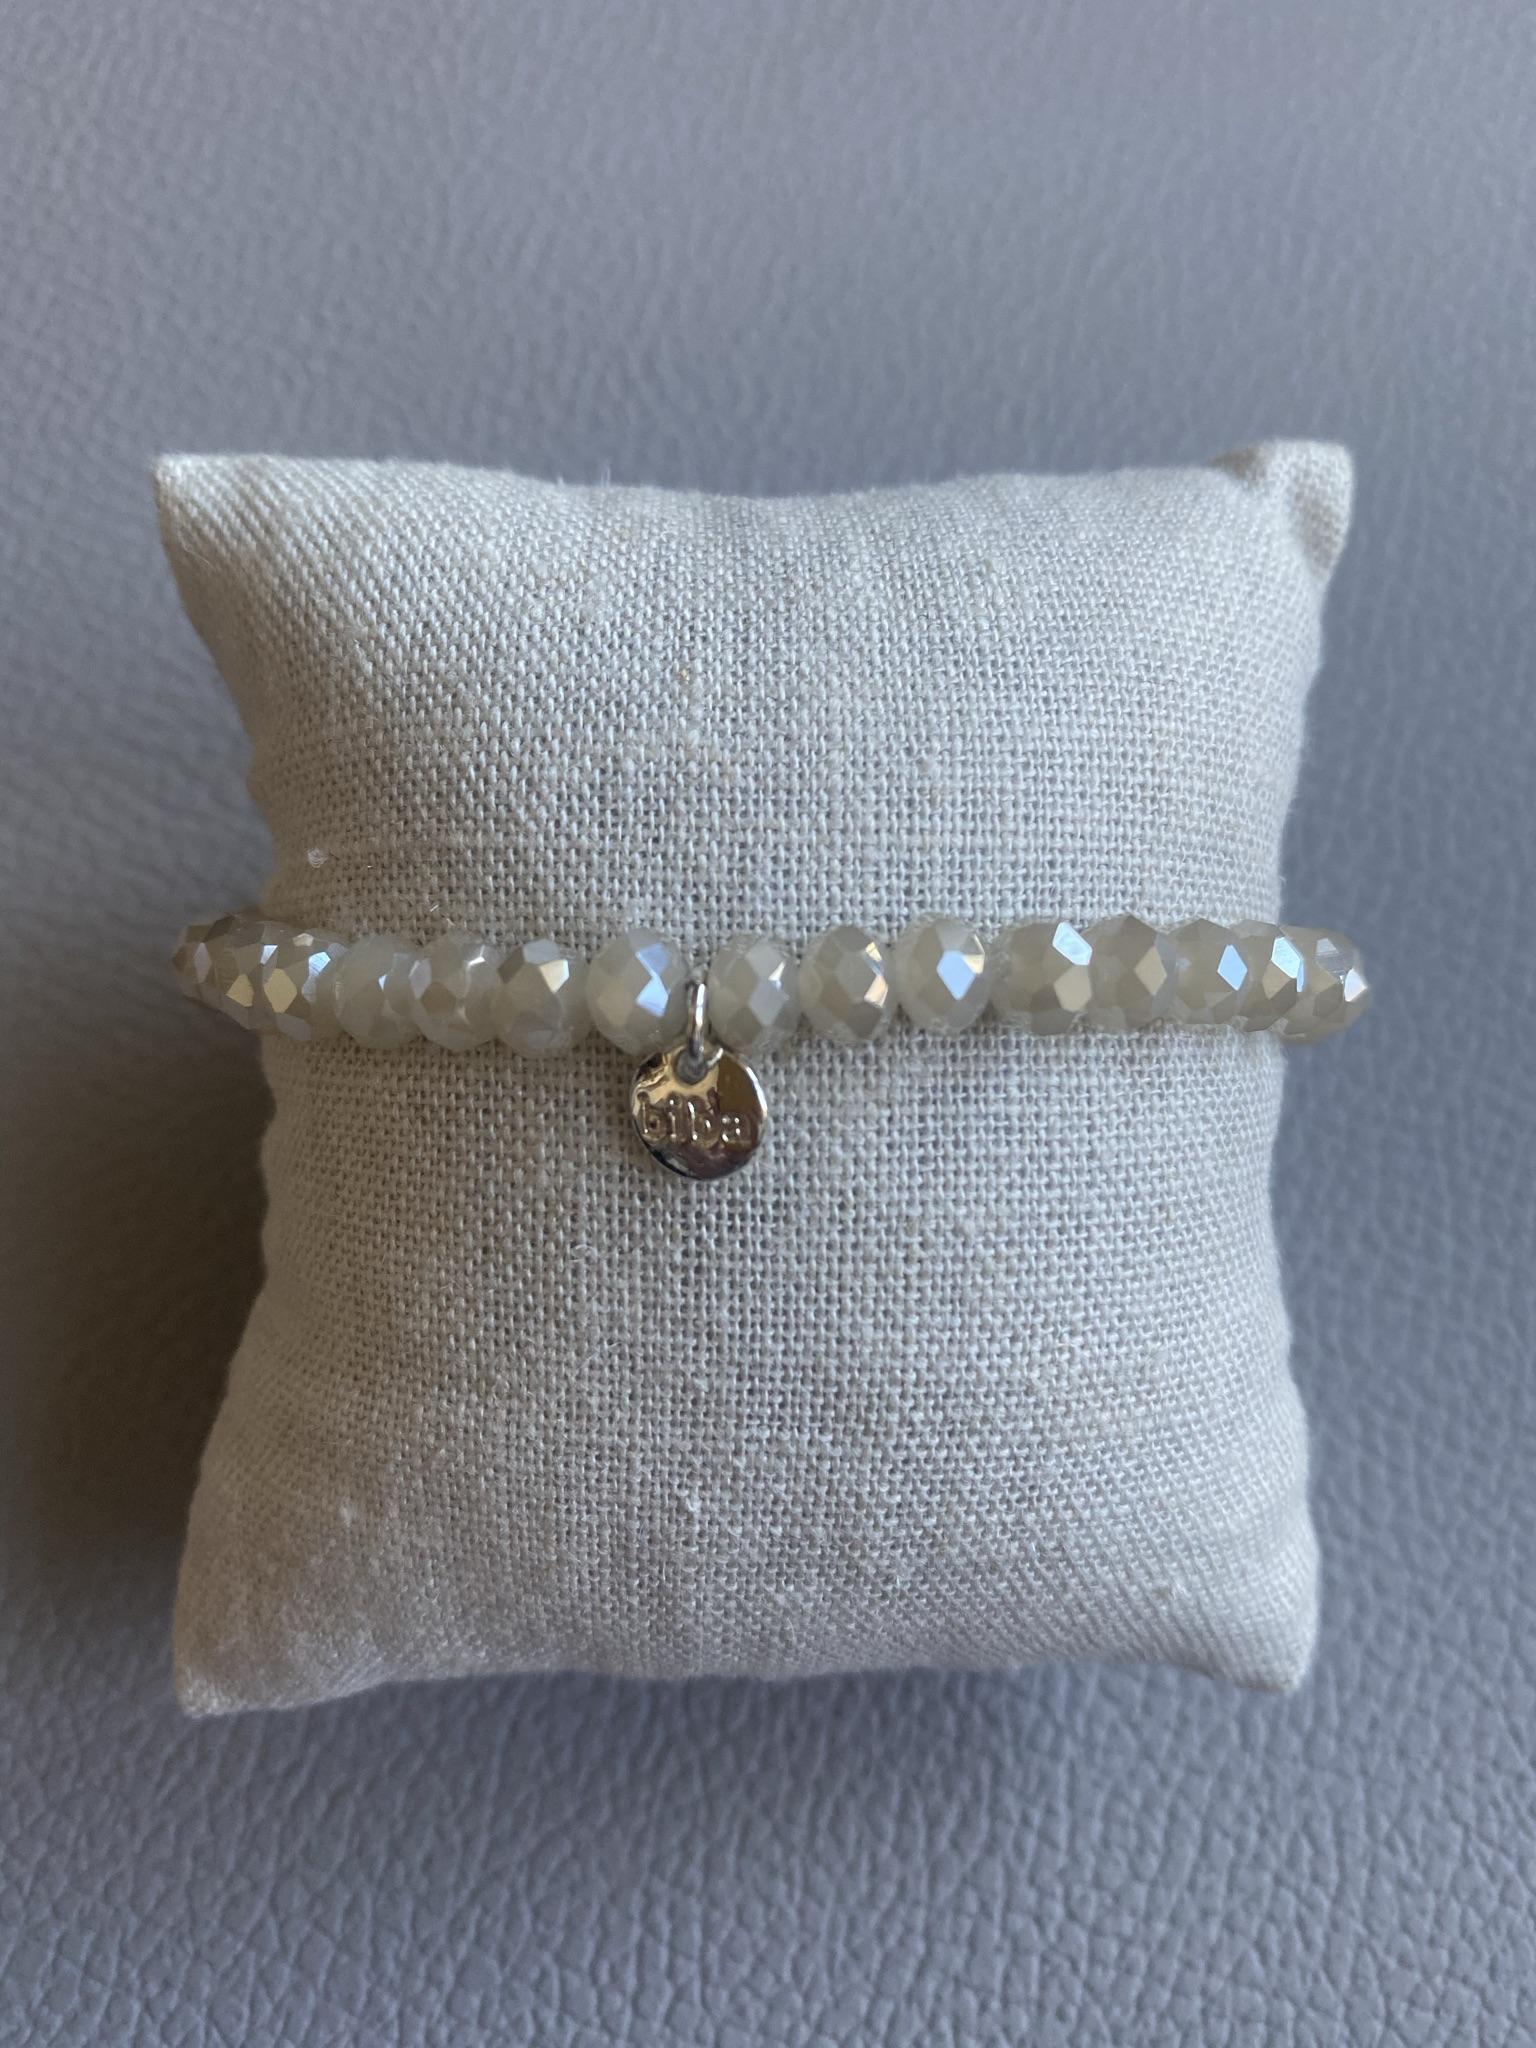 Biba Armband hellgrau/silber